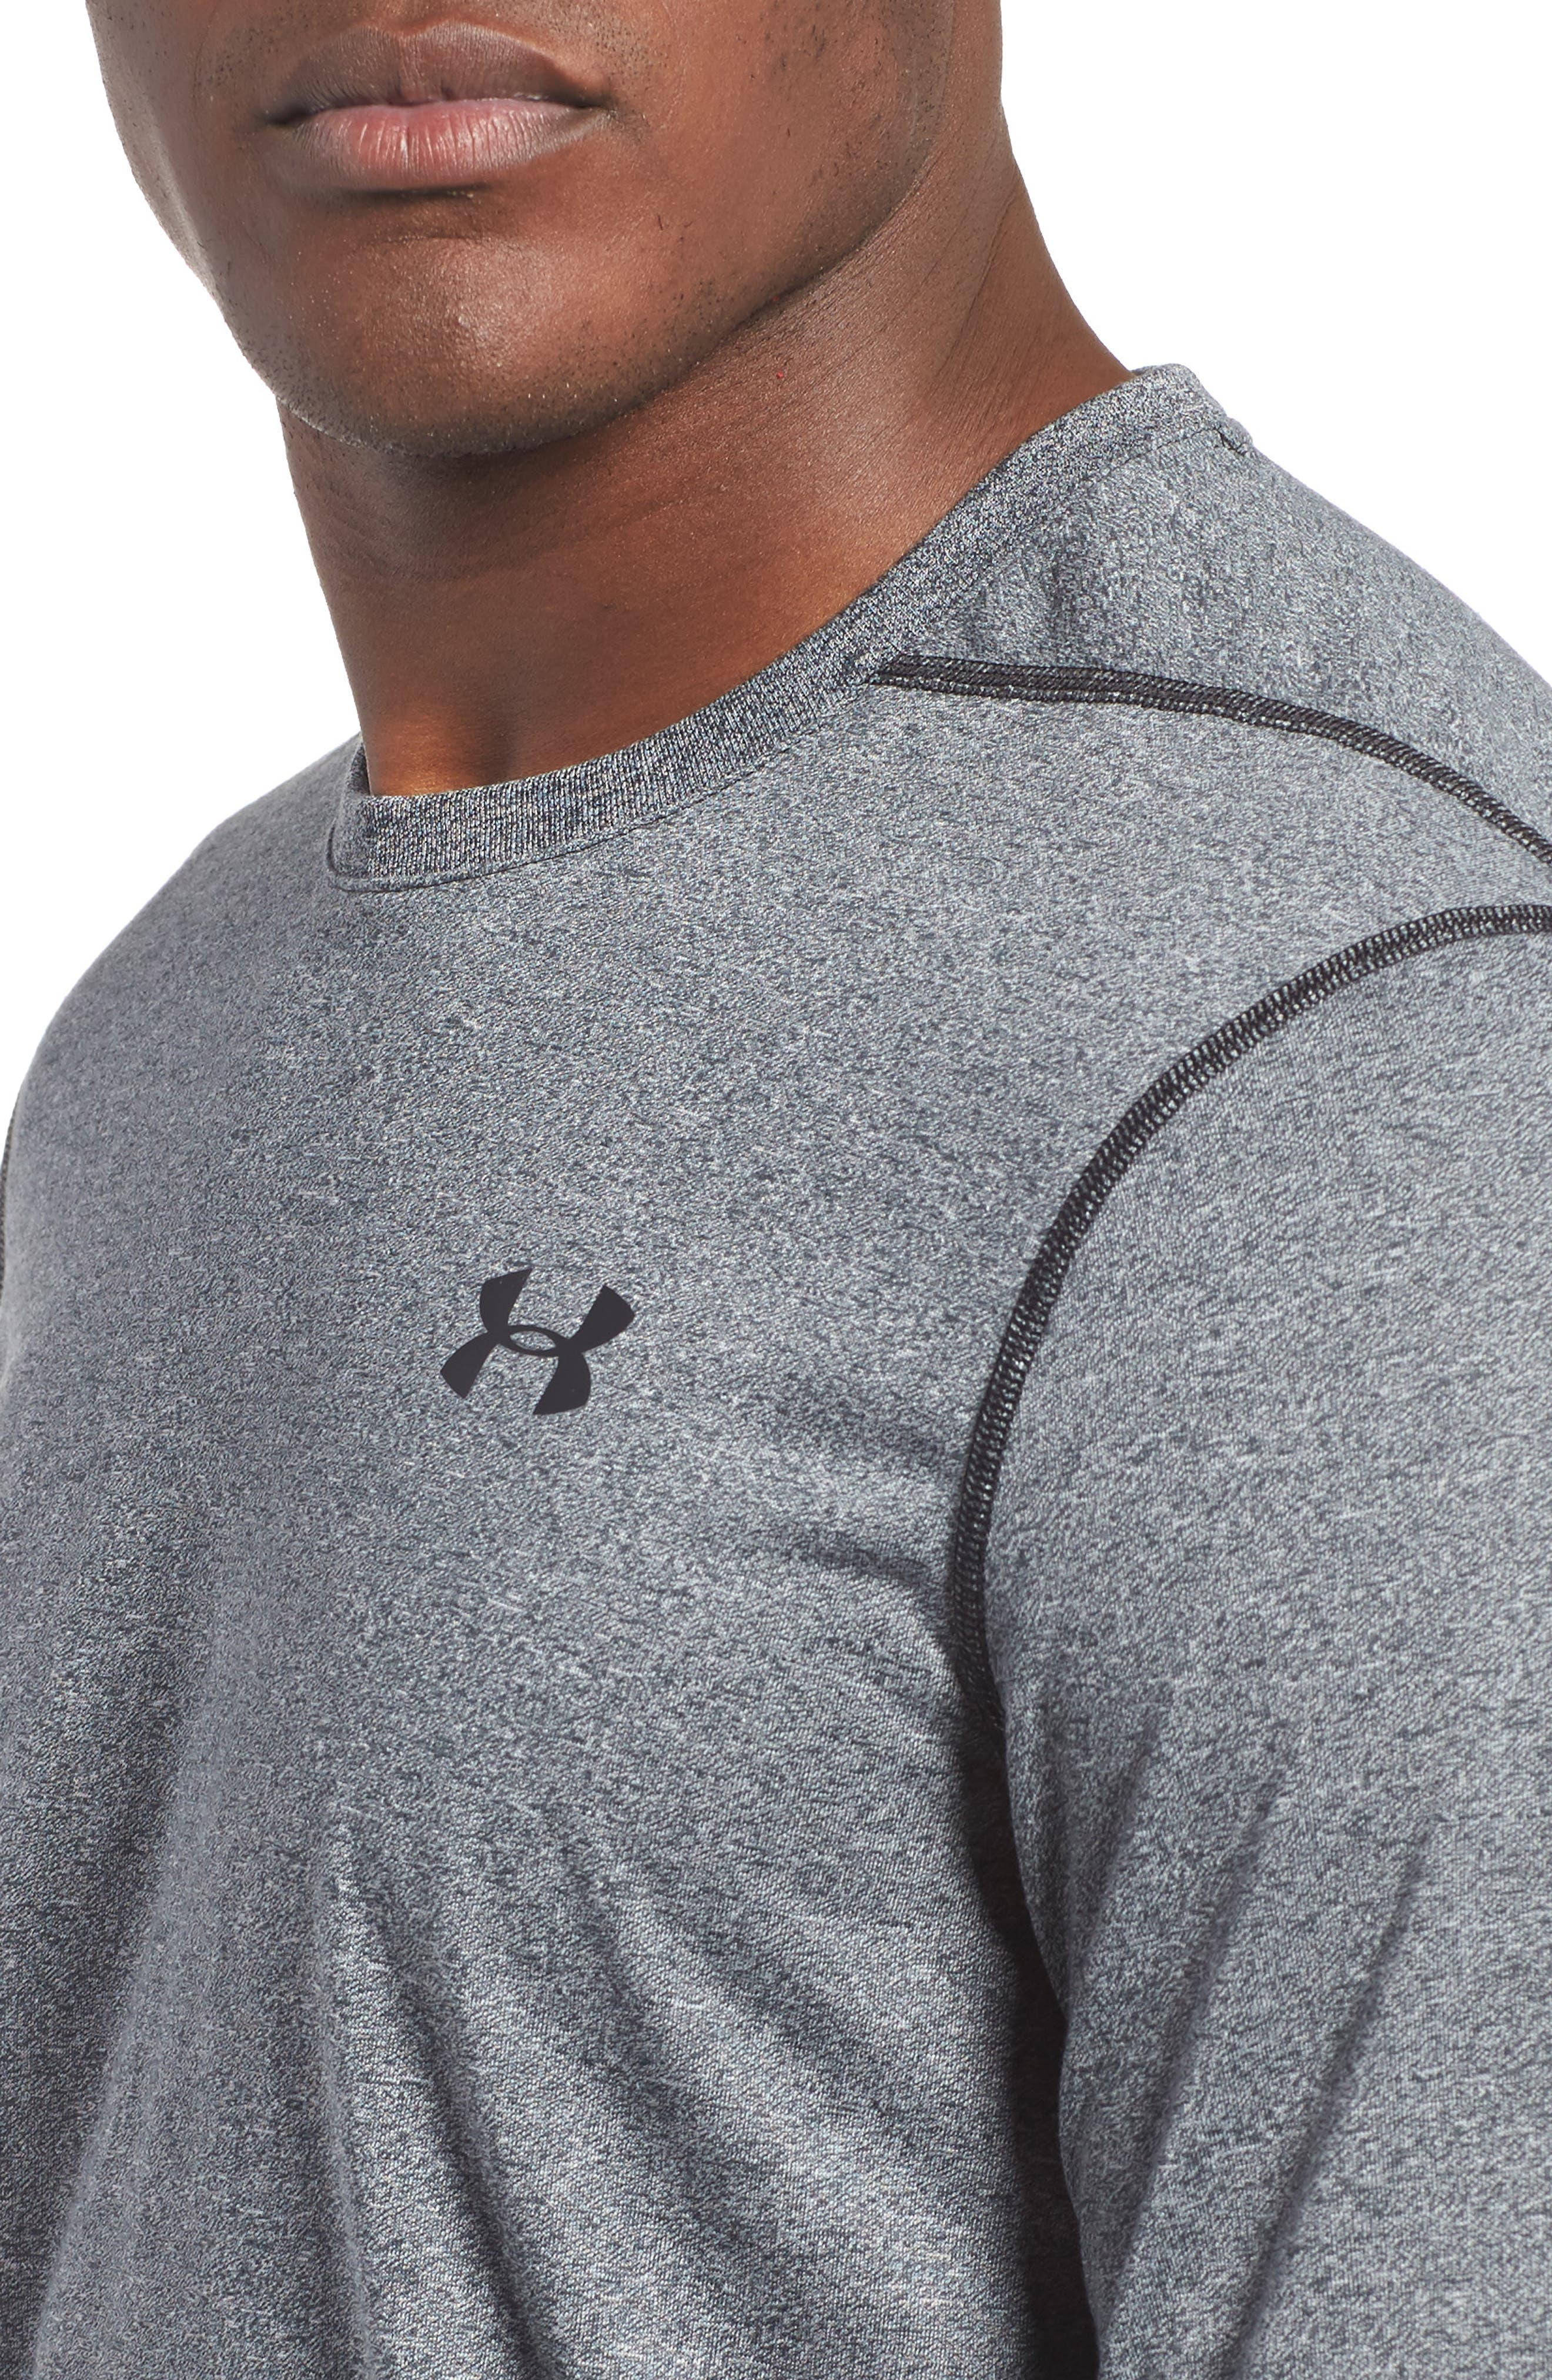 Regular Fit Threadborne T-Shirt,                             Alternate thumbnail 4, color,                             021